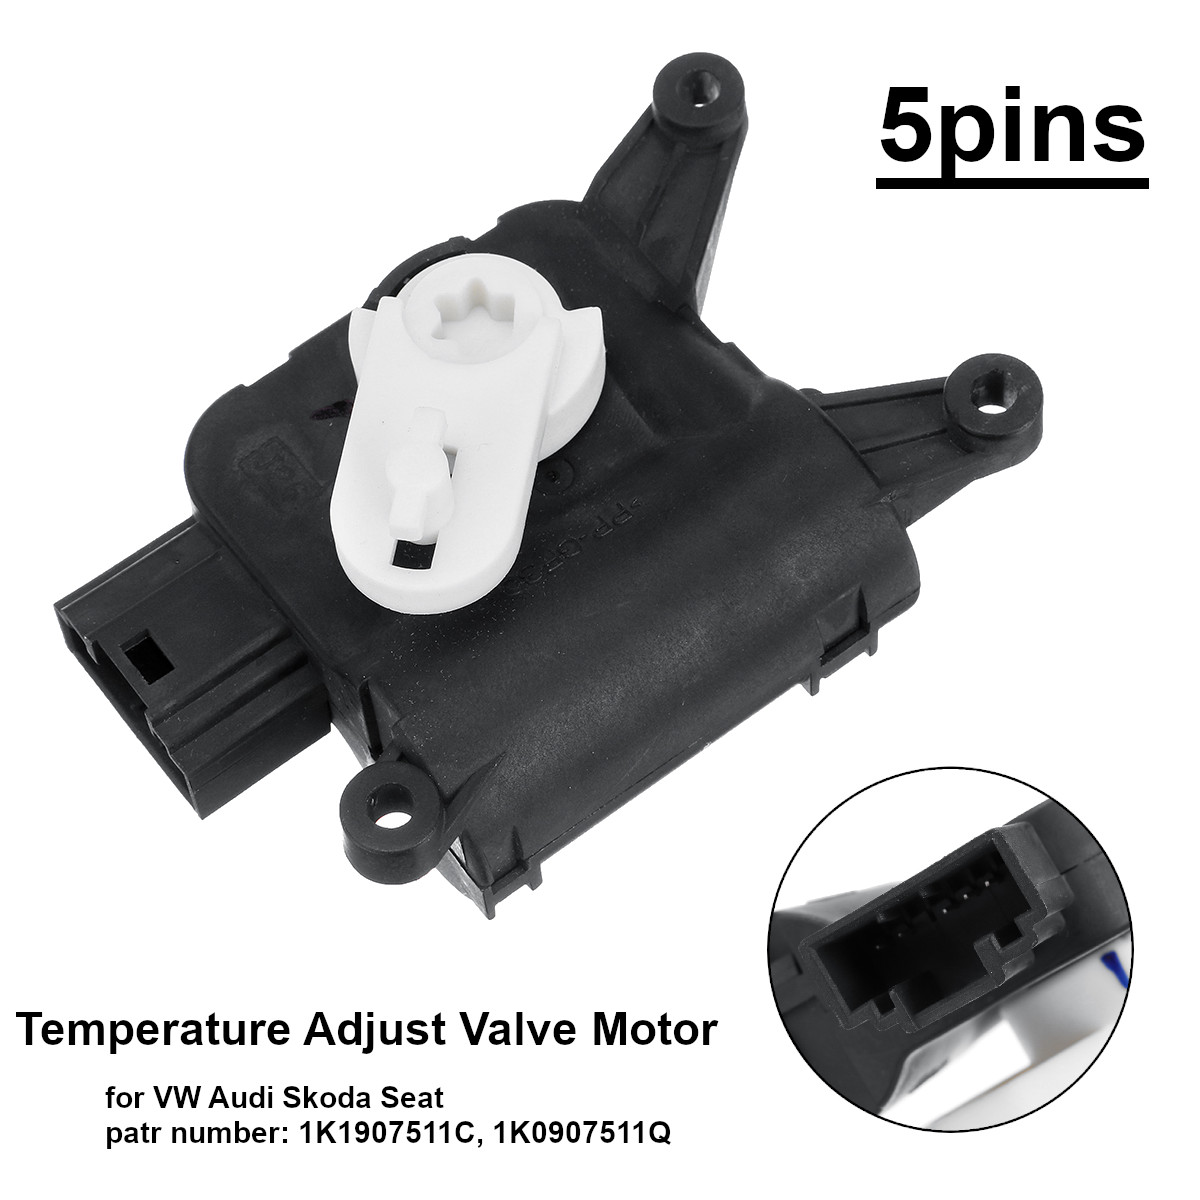 1k1907511c 1kd907511c temperatura ajustar válvula servo motor 5 pinos para vw eos golf gti jetta mk5 mk6 touran para audi a3 q3 tt ac